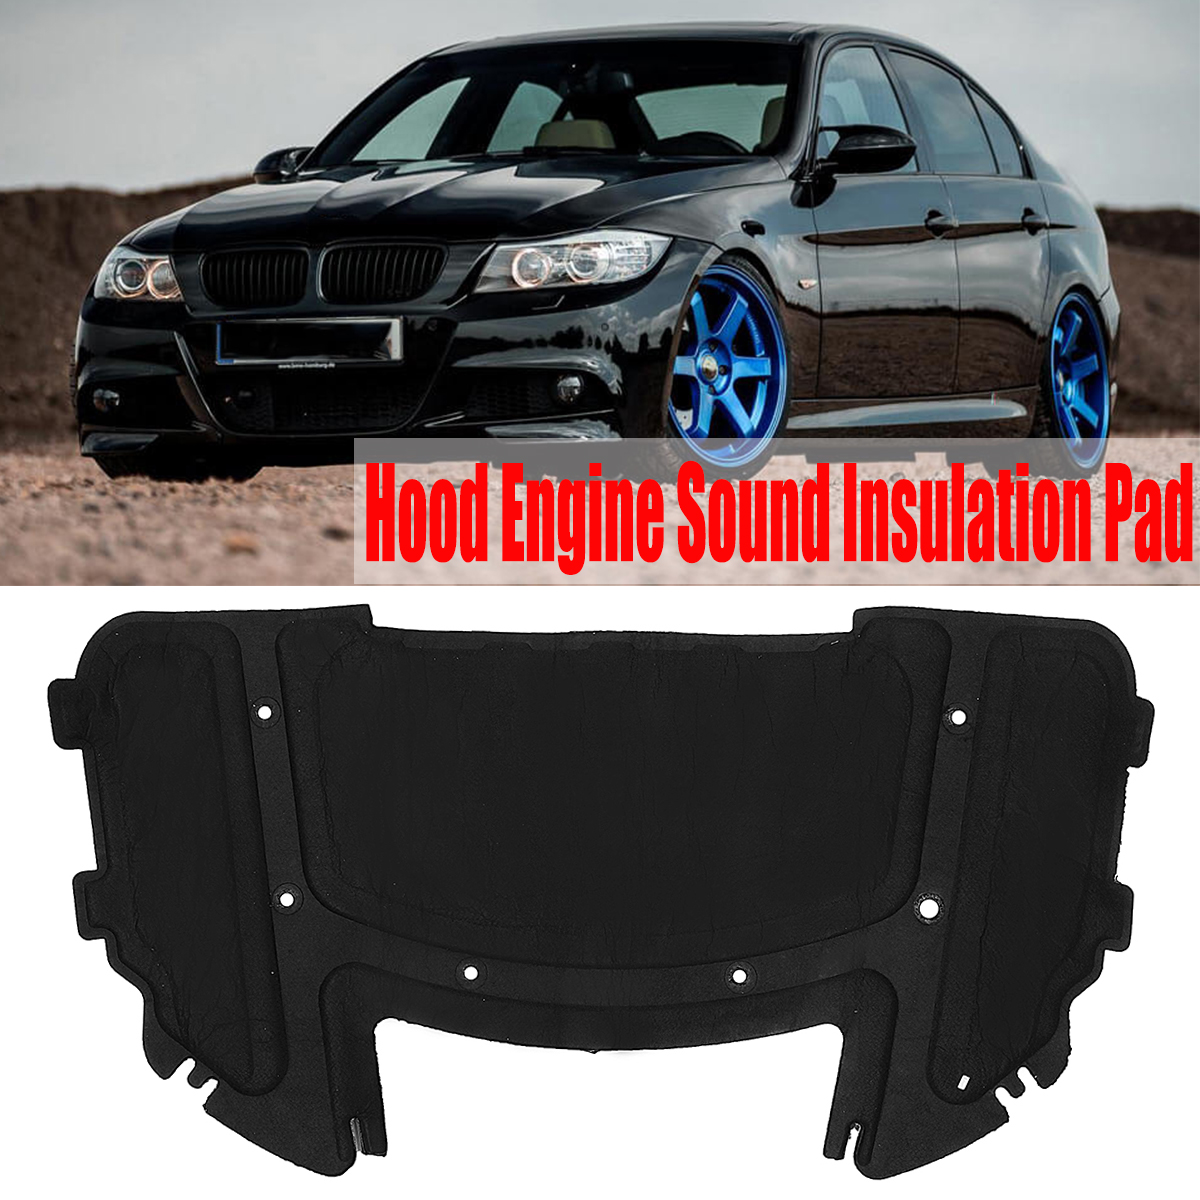 Tapis d'isolation thermique pour moteur de capot de voiture tapis d'isolation thermique pour BMW E90 E91 E92 E93 323i 325i 51487059260